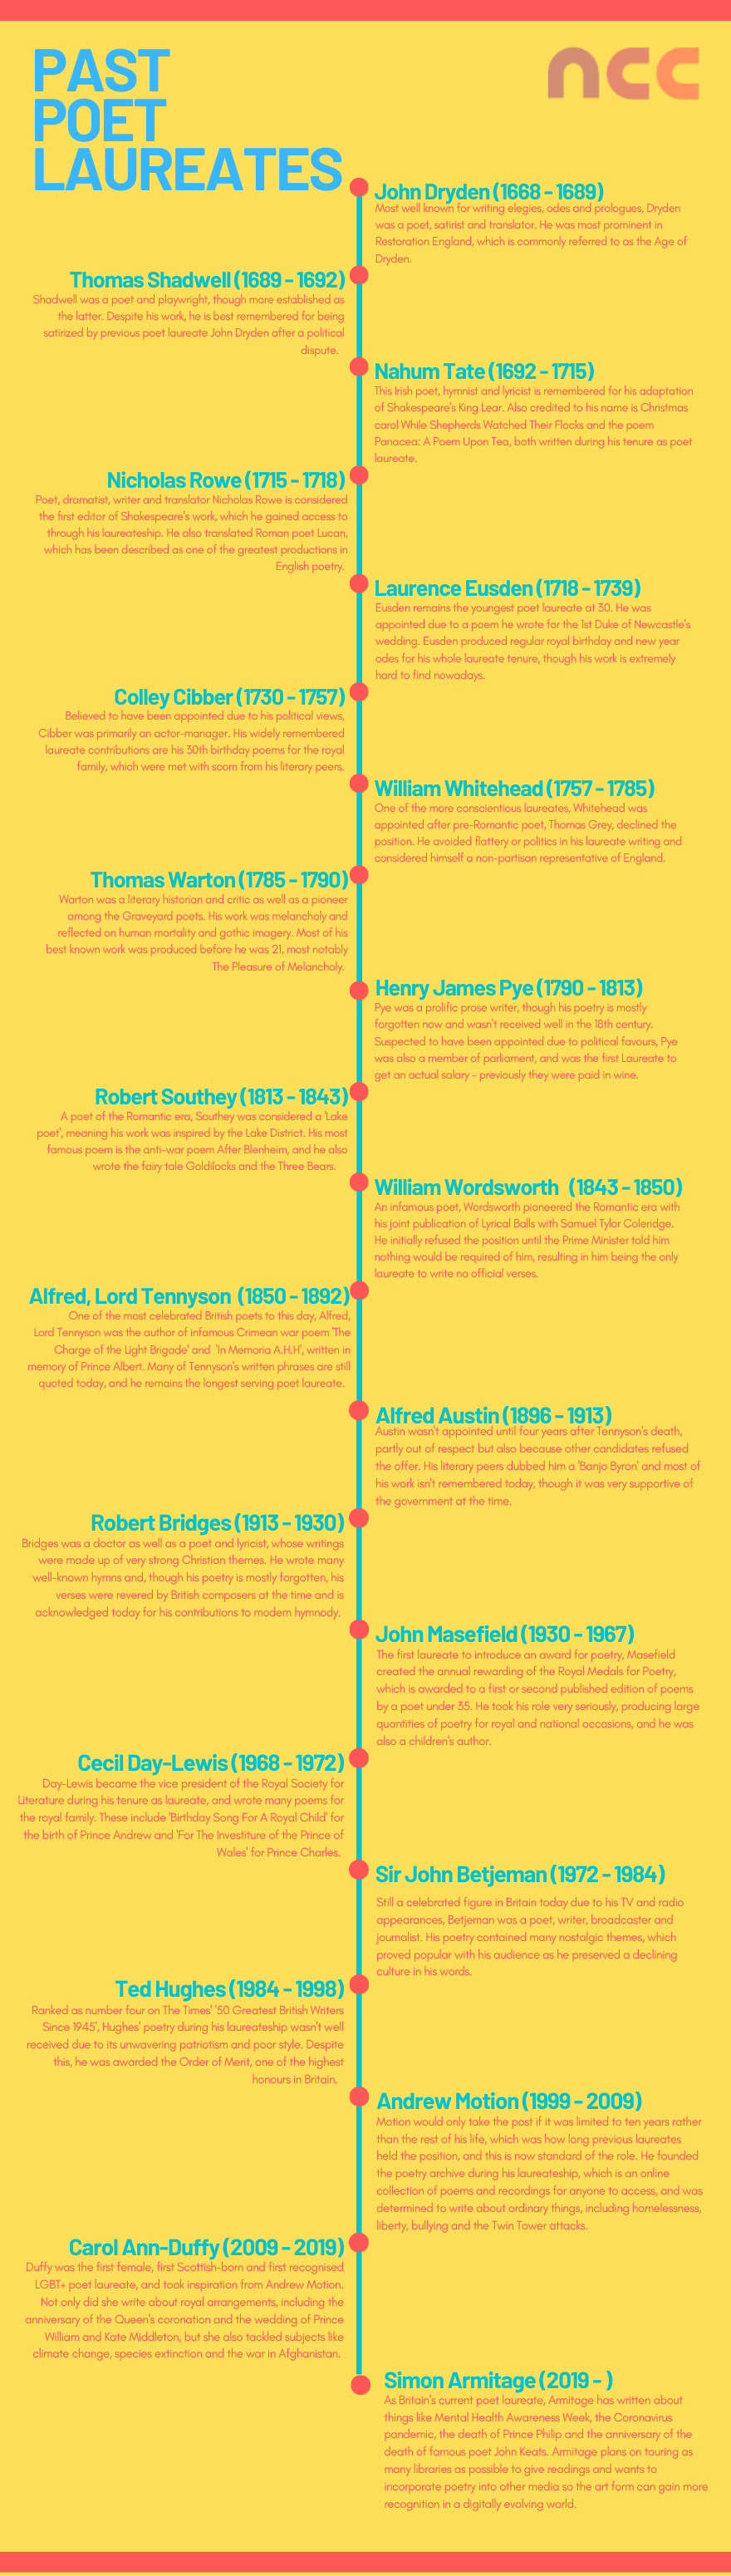 Poet laureate infographic